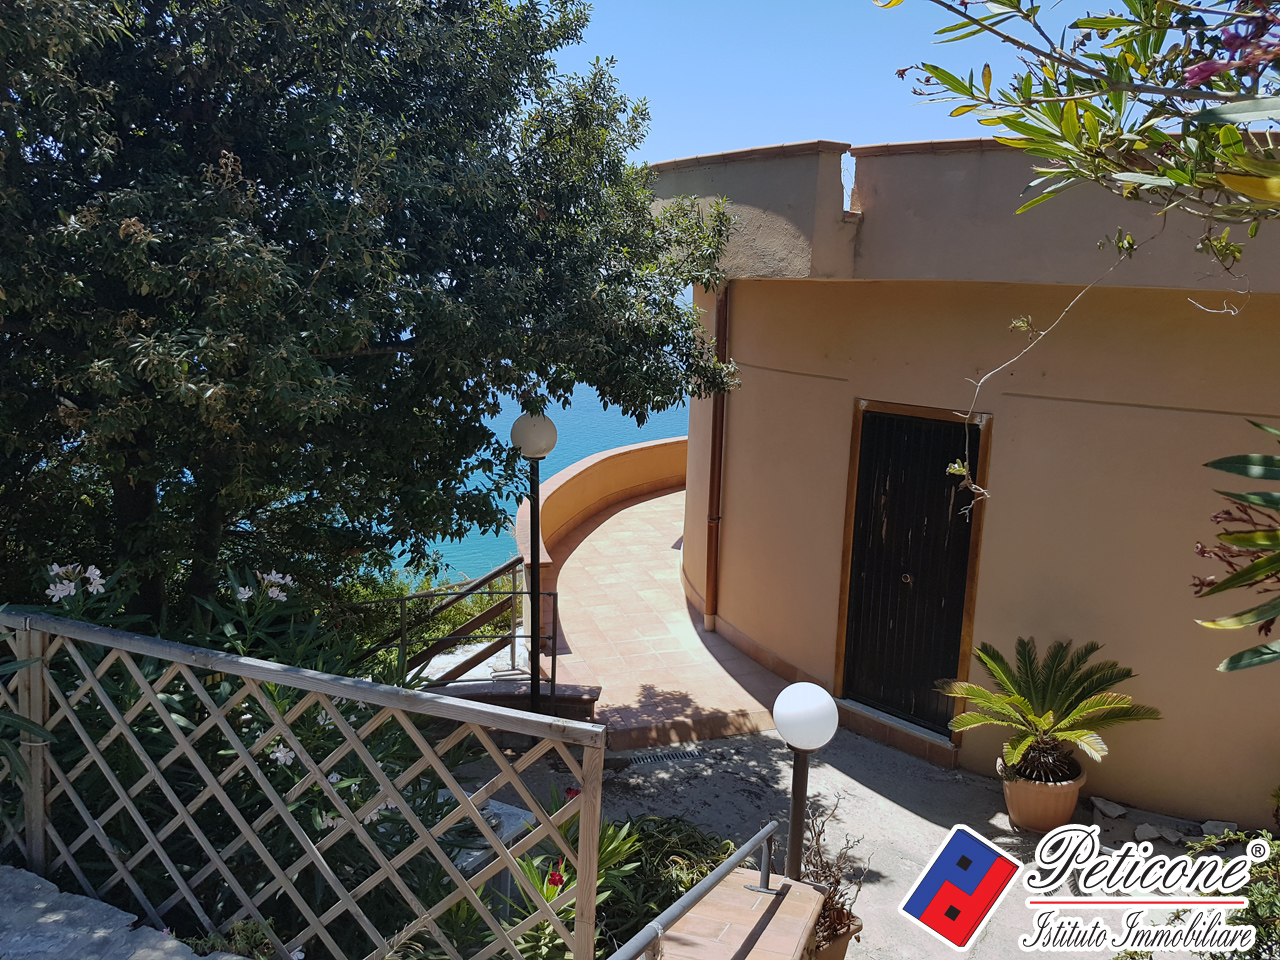 Villa in Vendita a Sperlonga: 4 locali, 90 mq - Foto 1